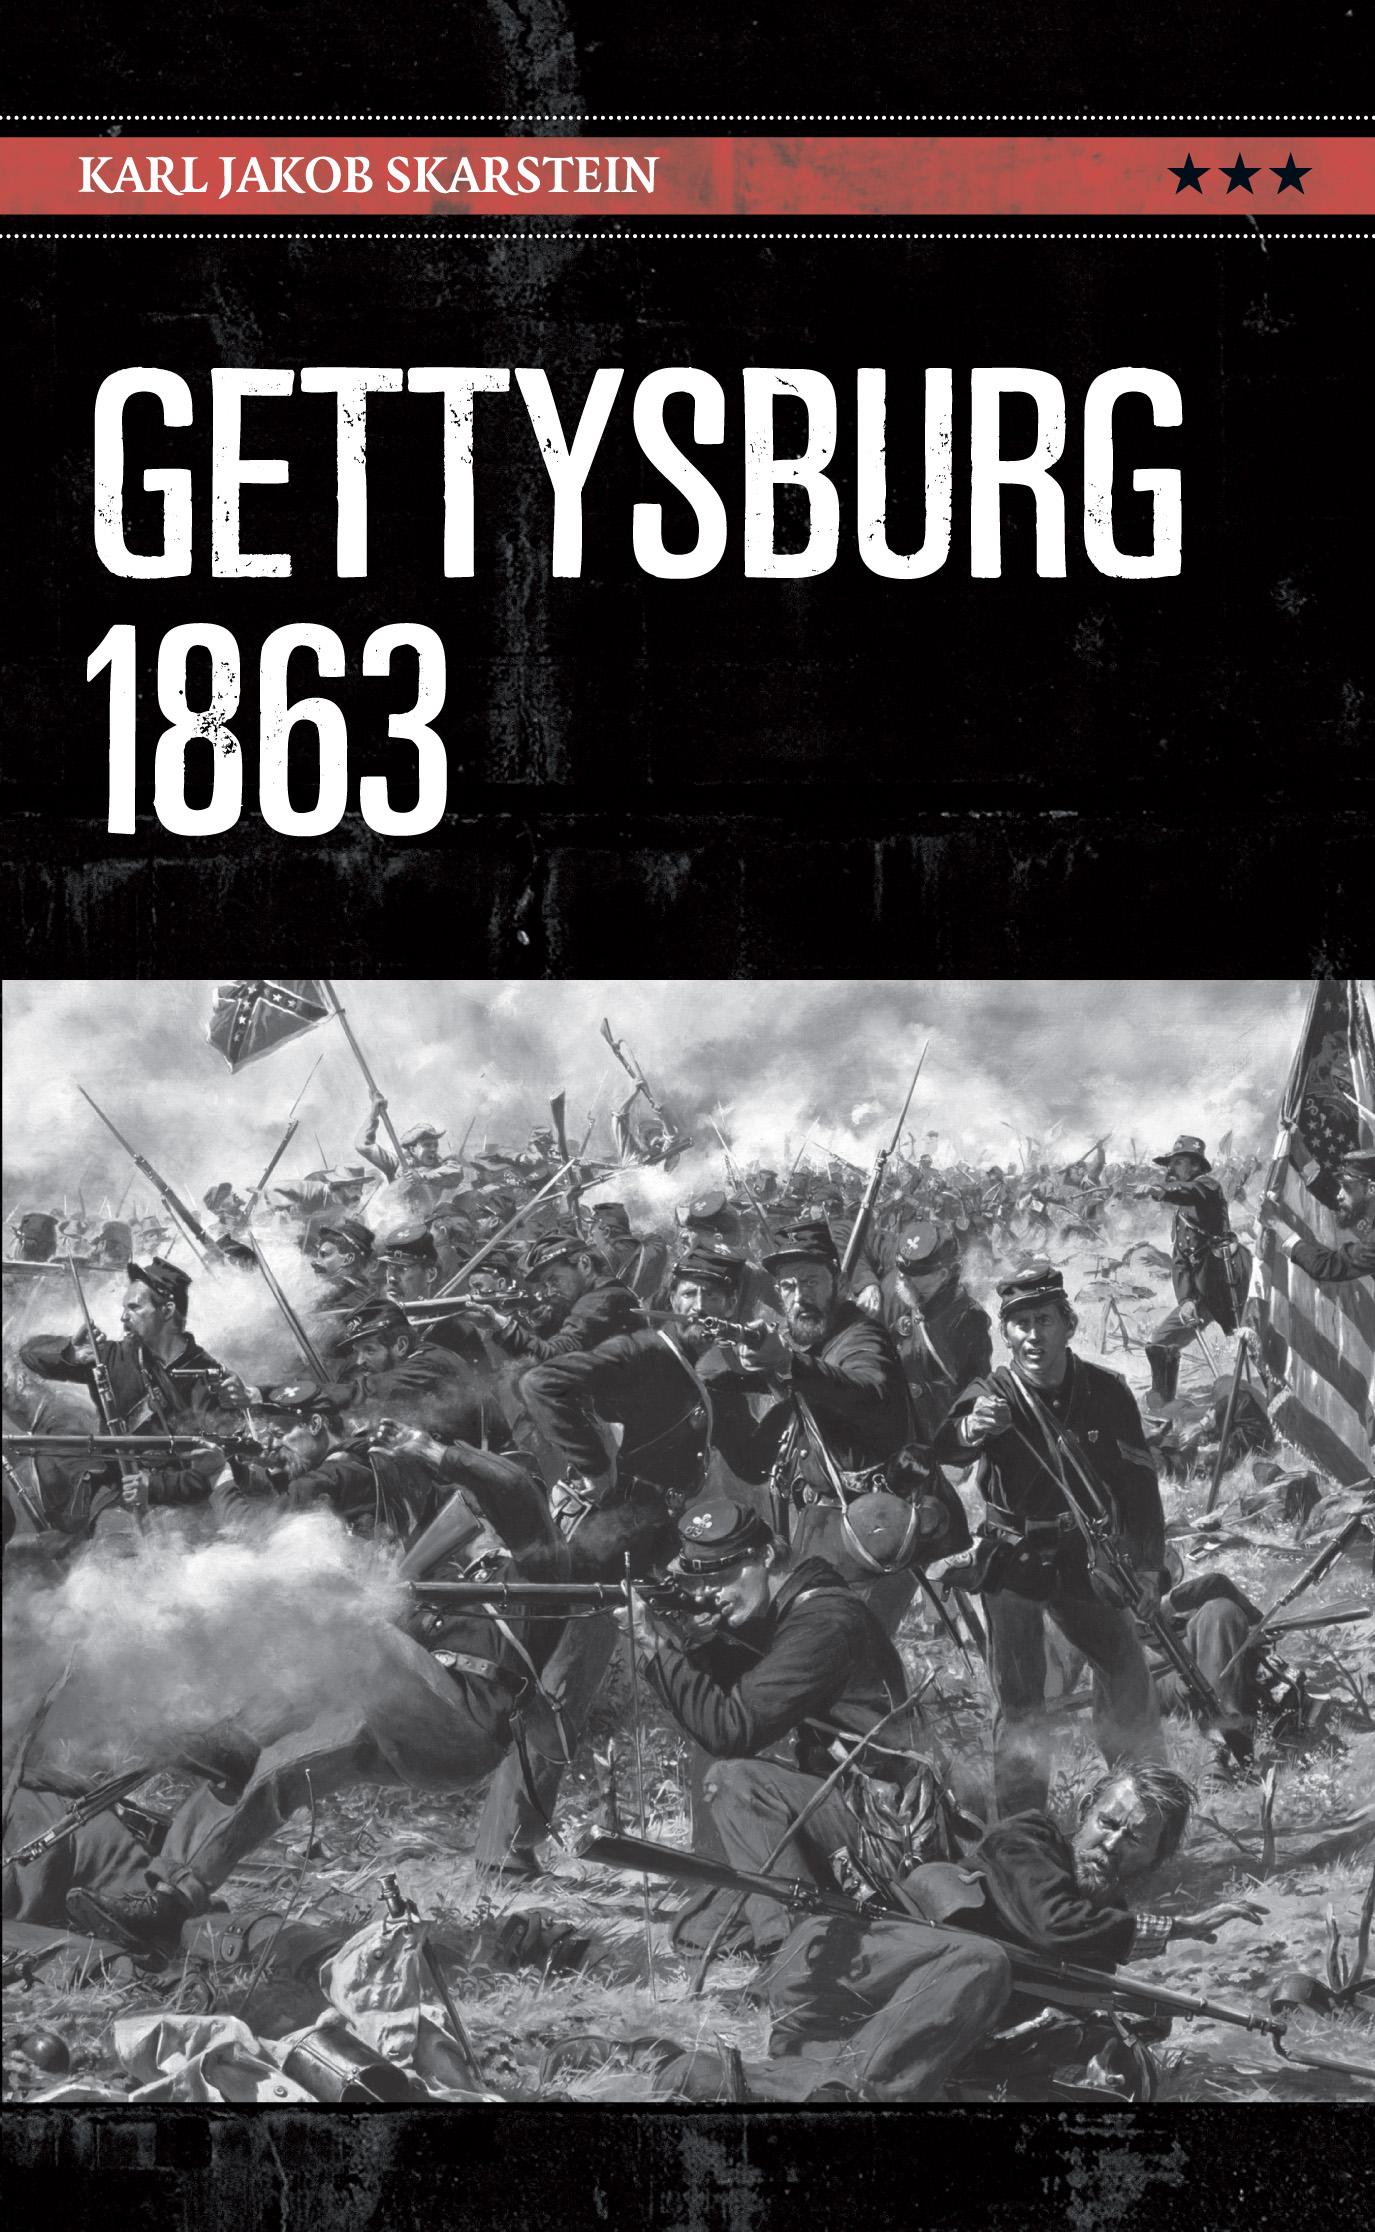 Gettysburg 1863 1864